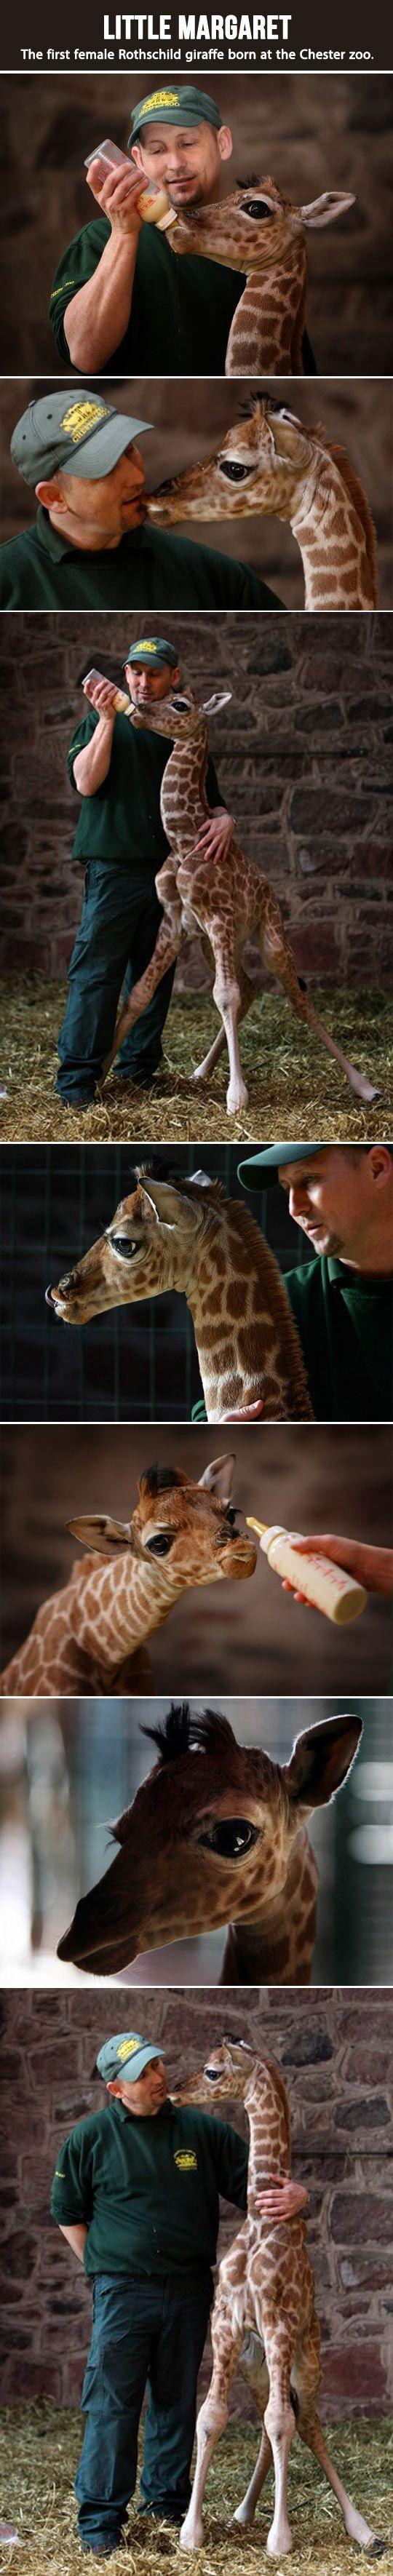 A baby giraffe called Margaret